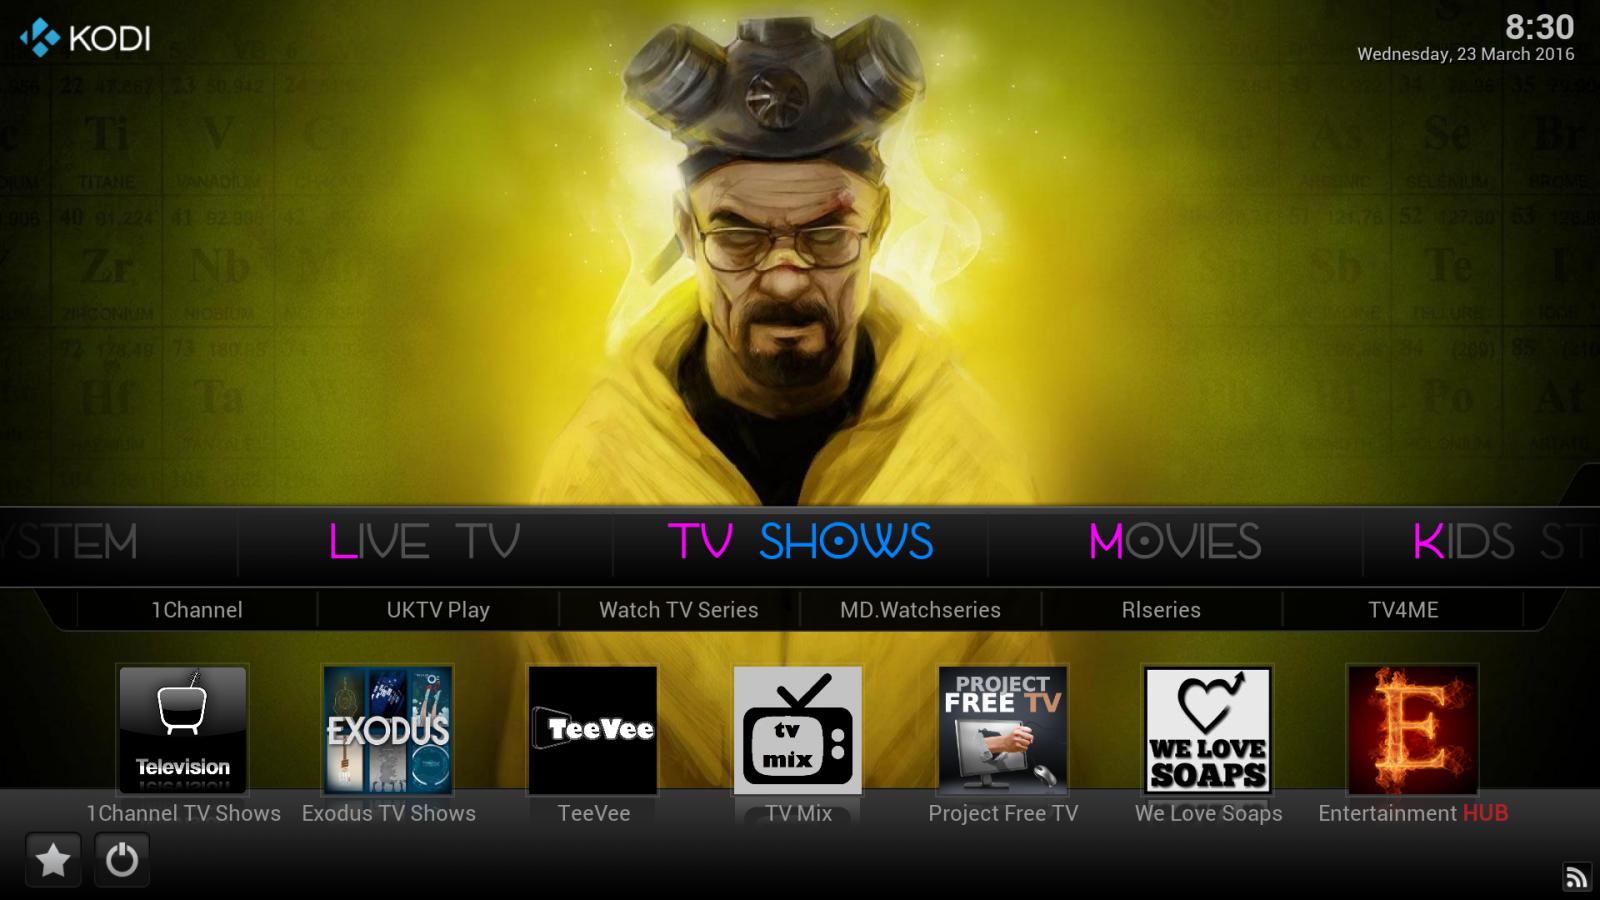 how to watch new movies on kodi